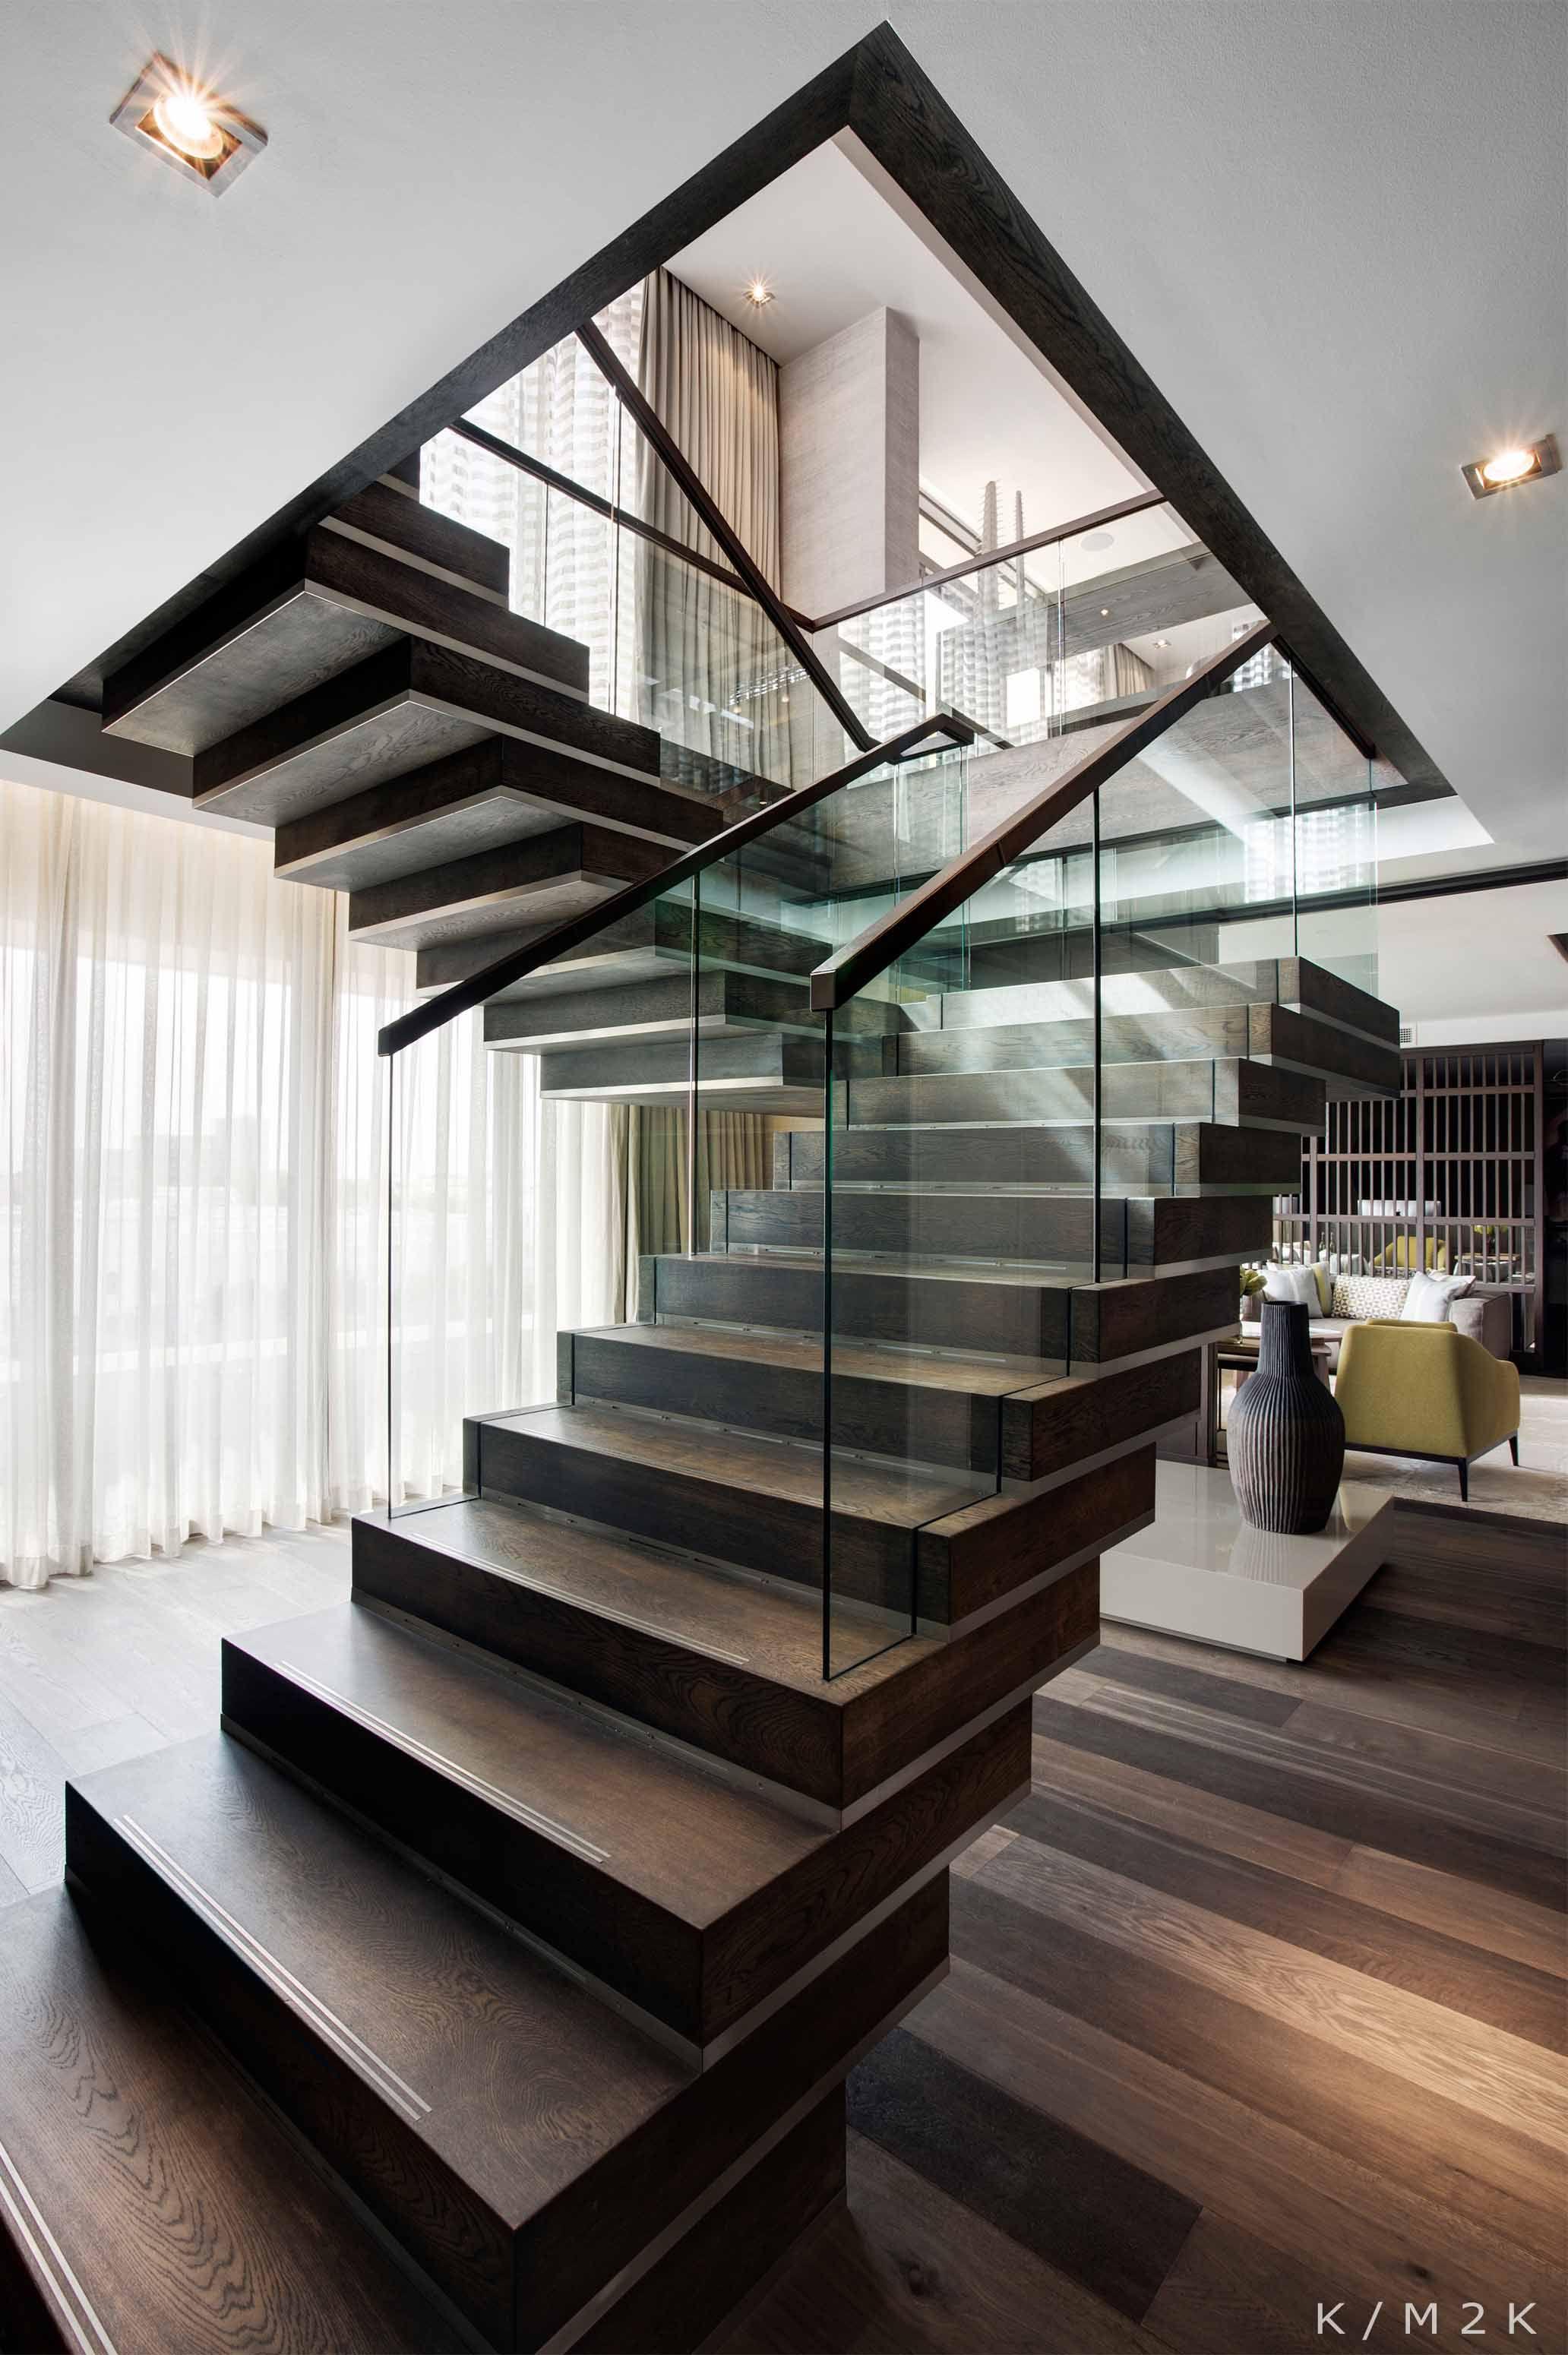 Top 10 Favorite Staircases Staircase Designs Con Immagini